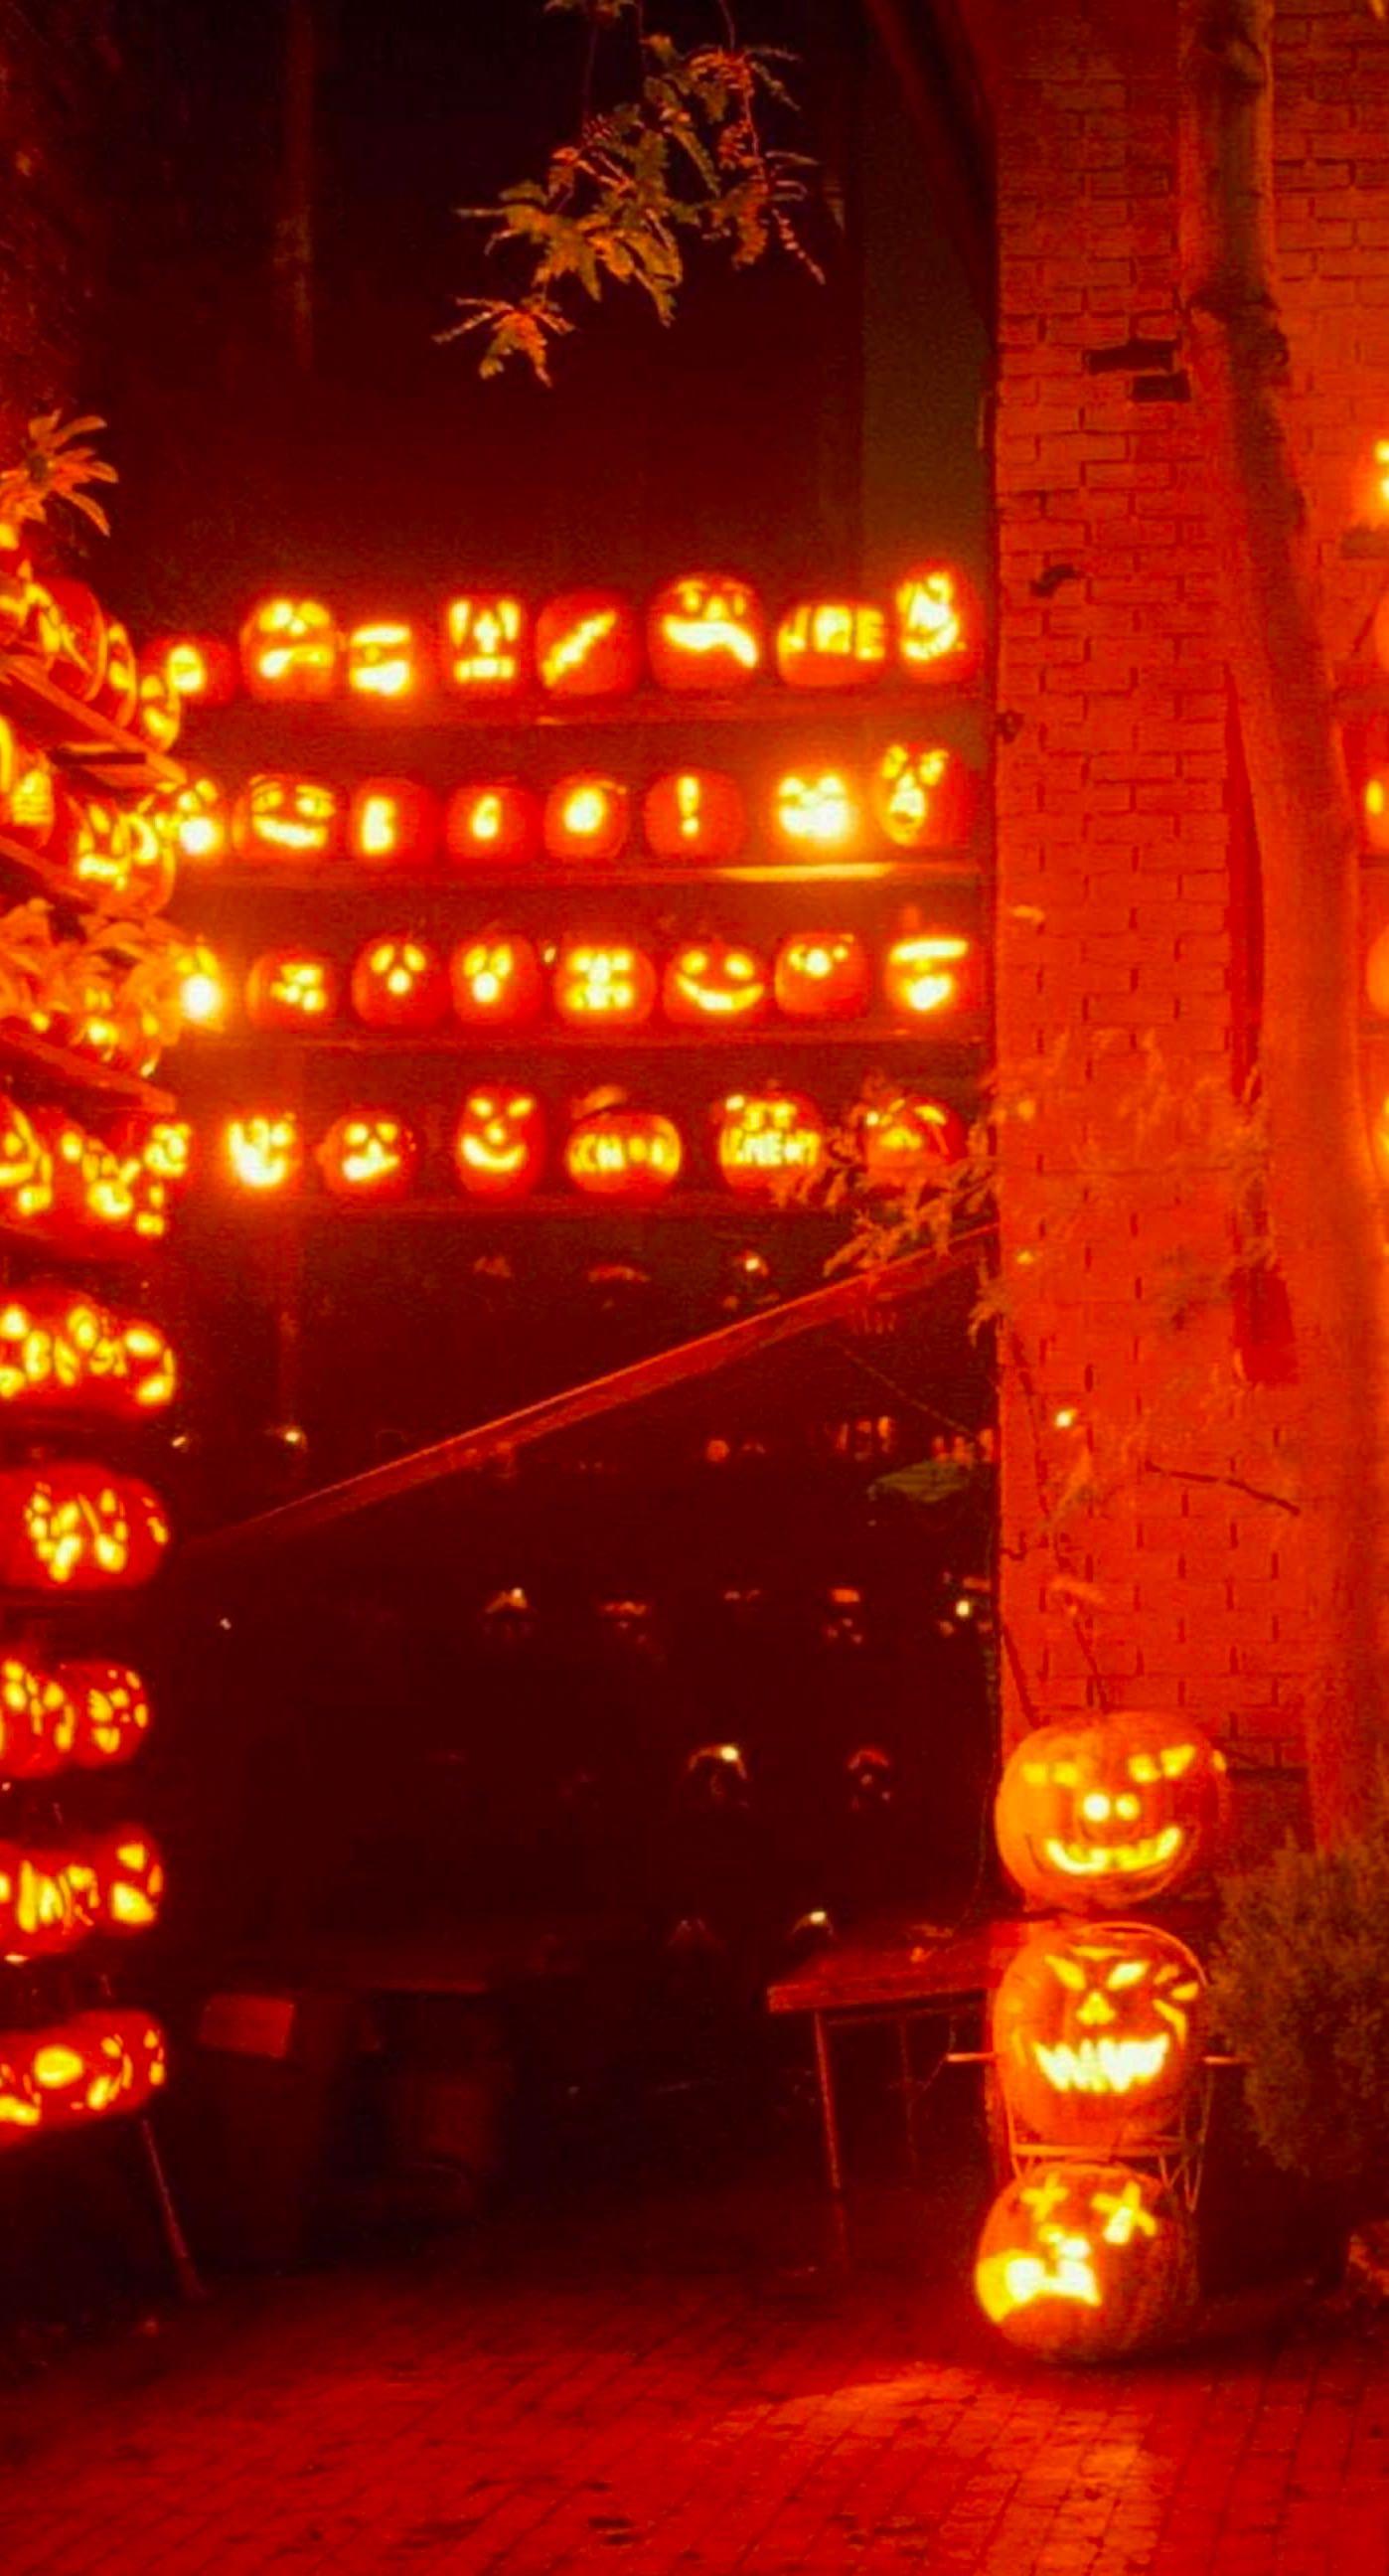 Halloween Red Wallpaper Sc Iphone8plus